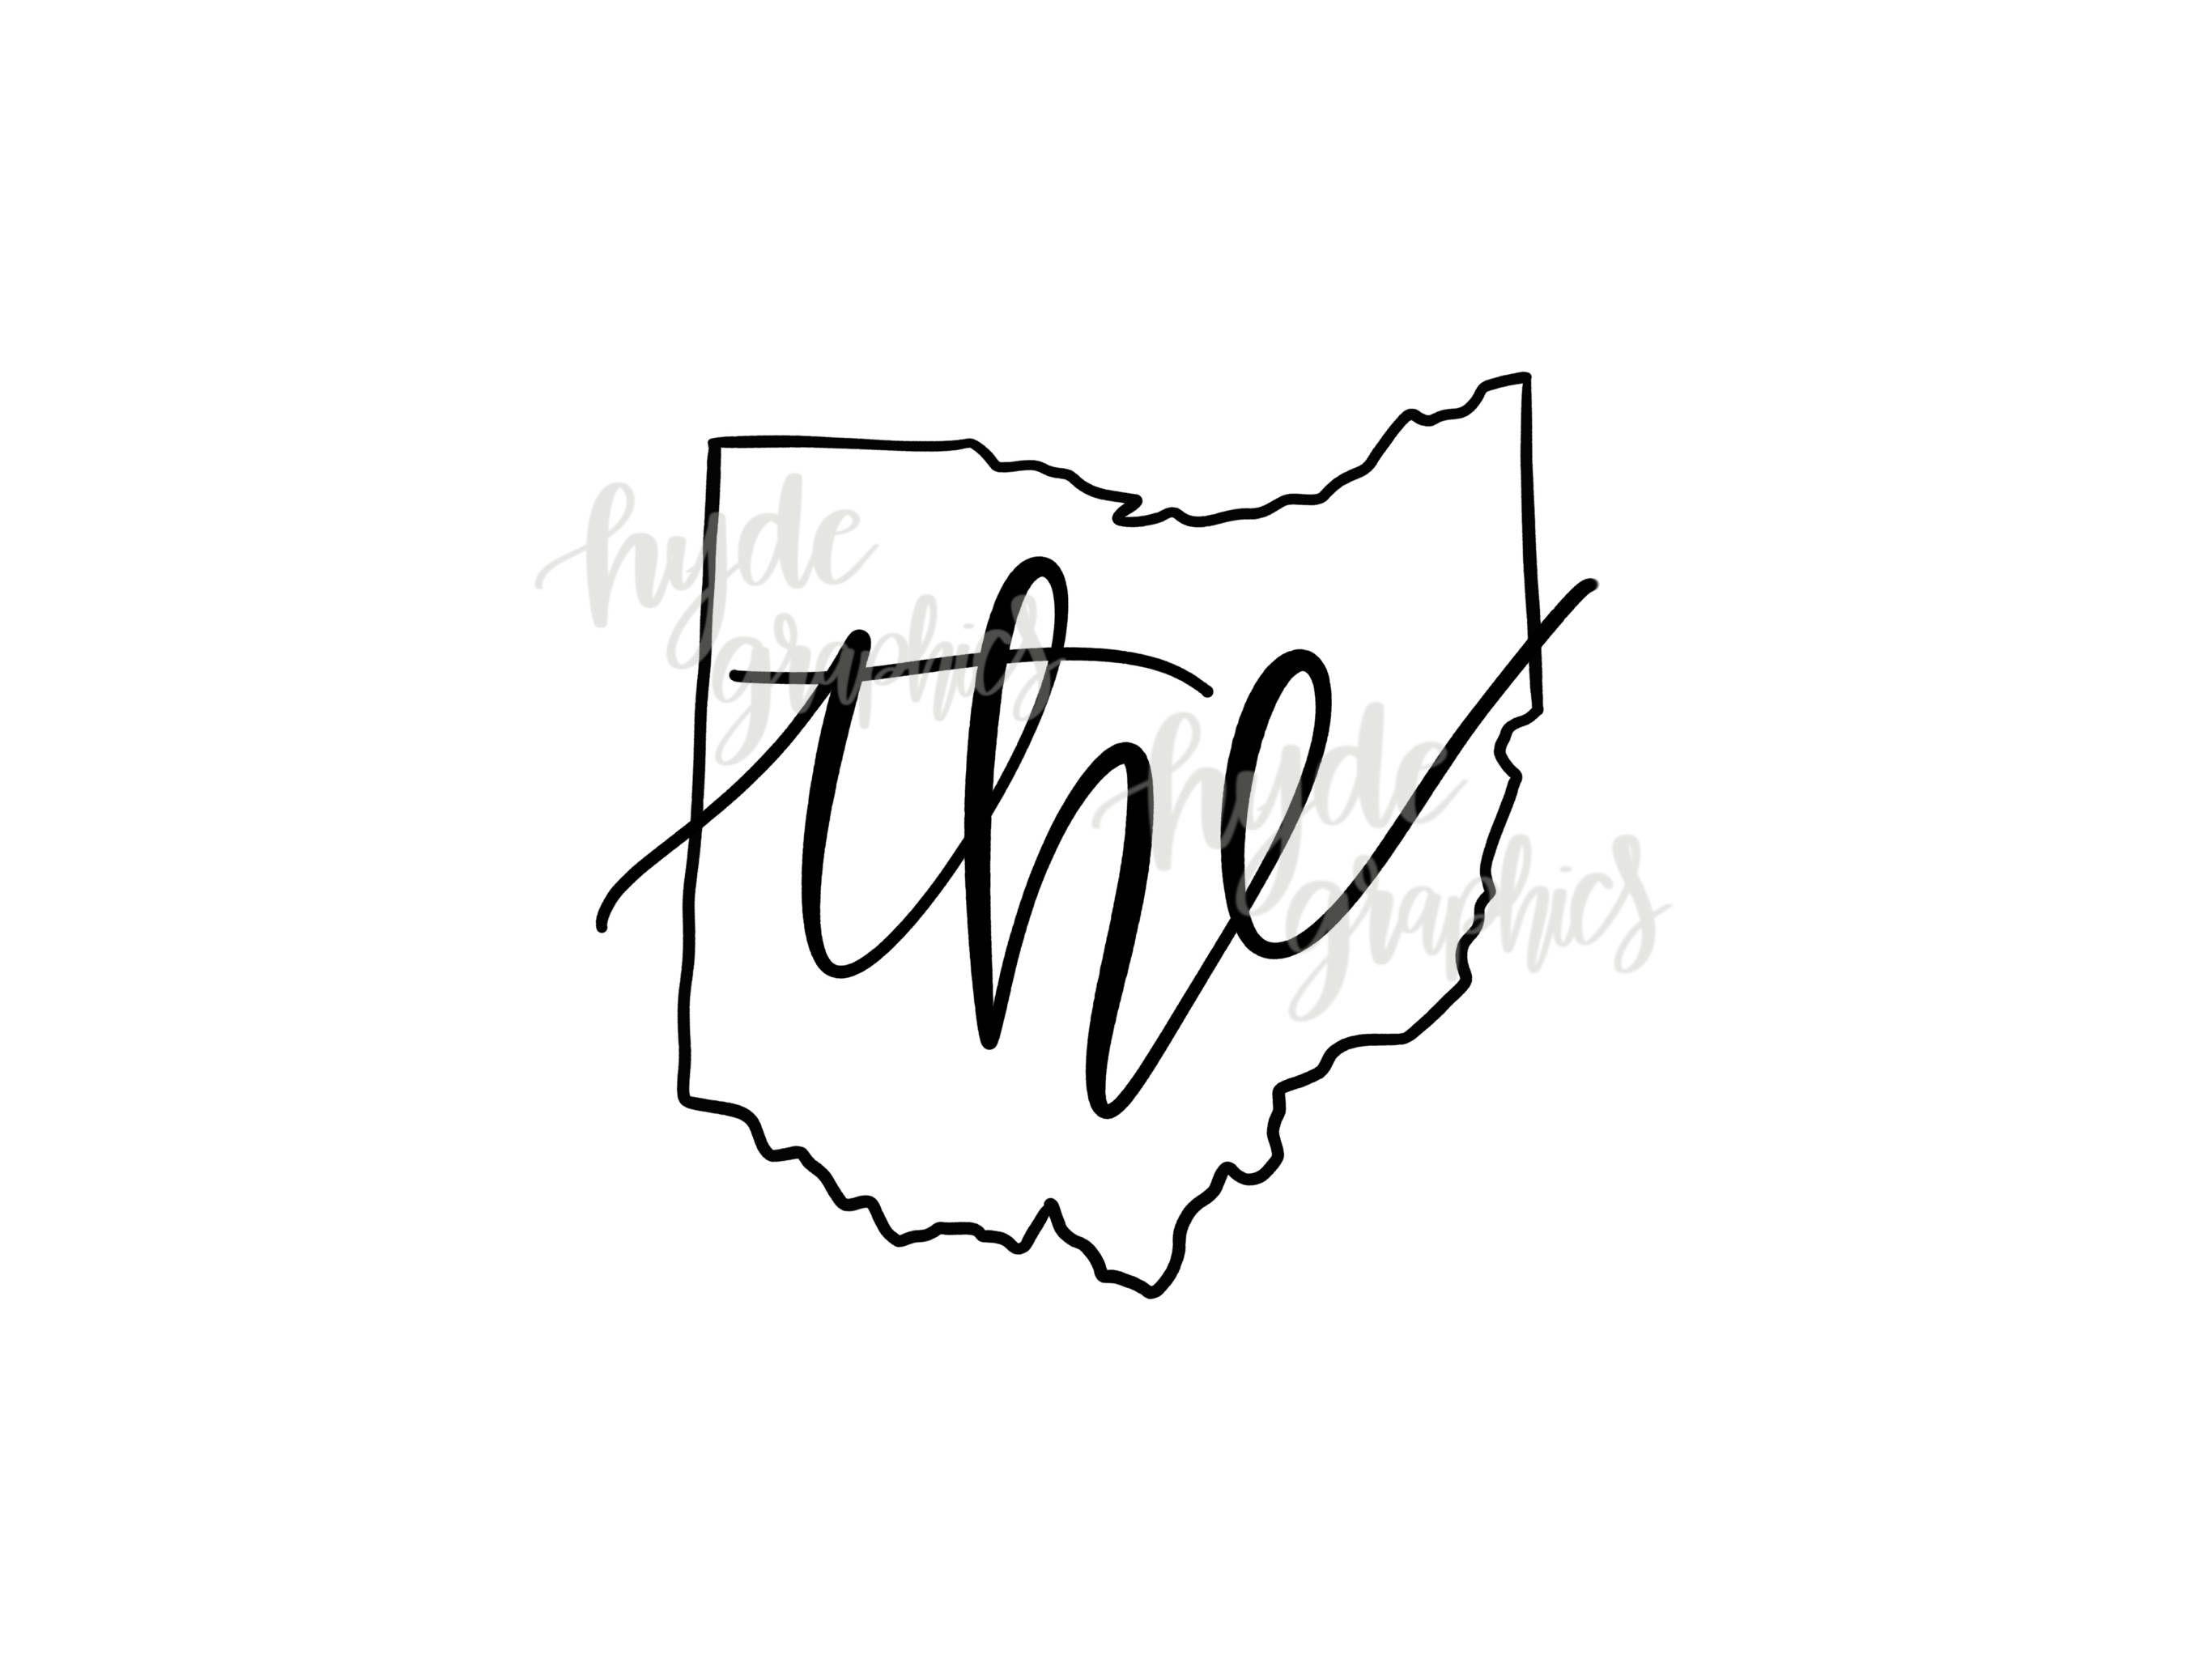 The Ohio State Outline Svg File Ohio Outline Svg Design Etsy State Outline Ohio Outline Ohio State Tattoos